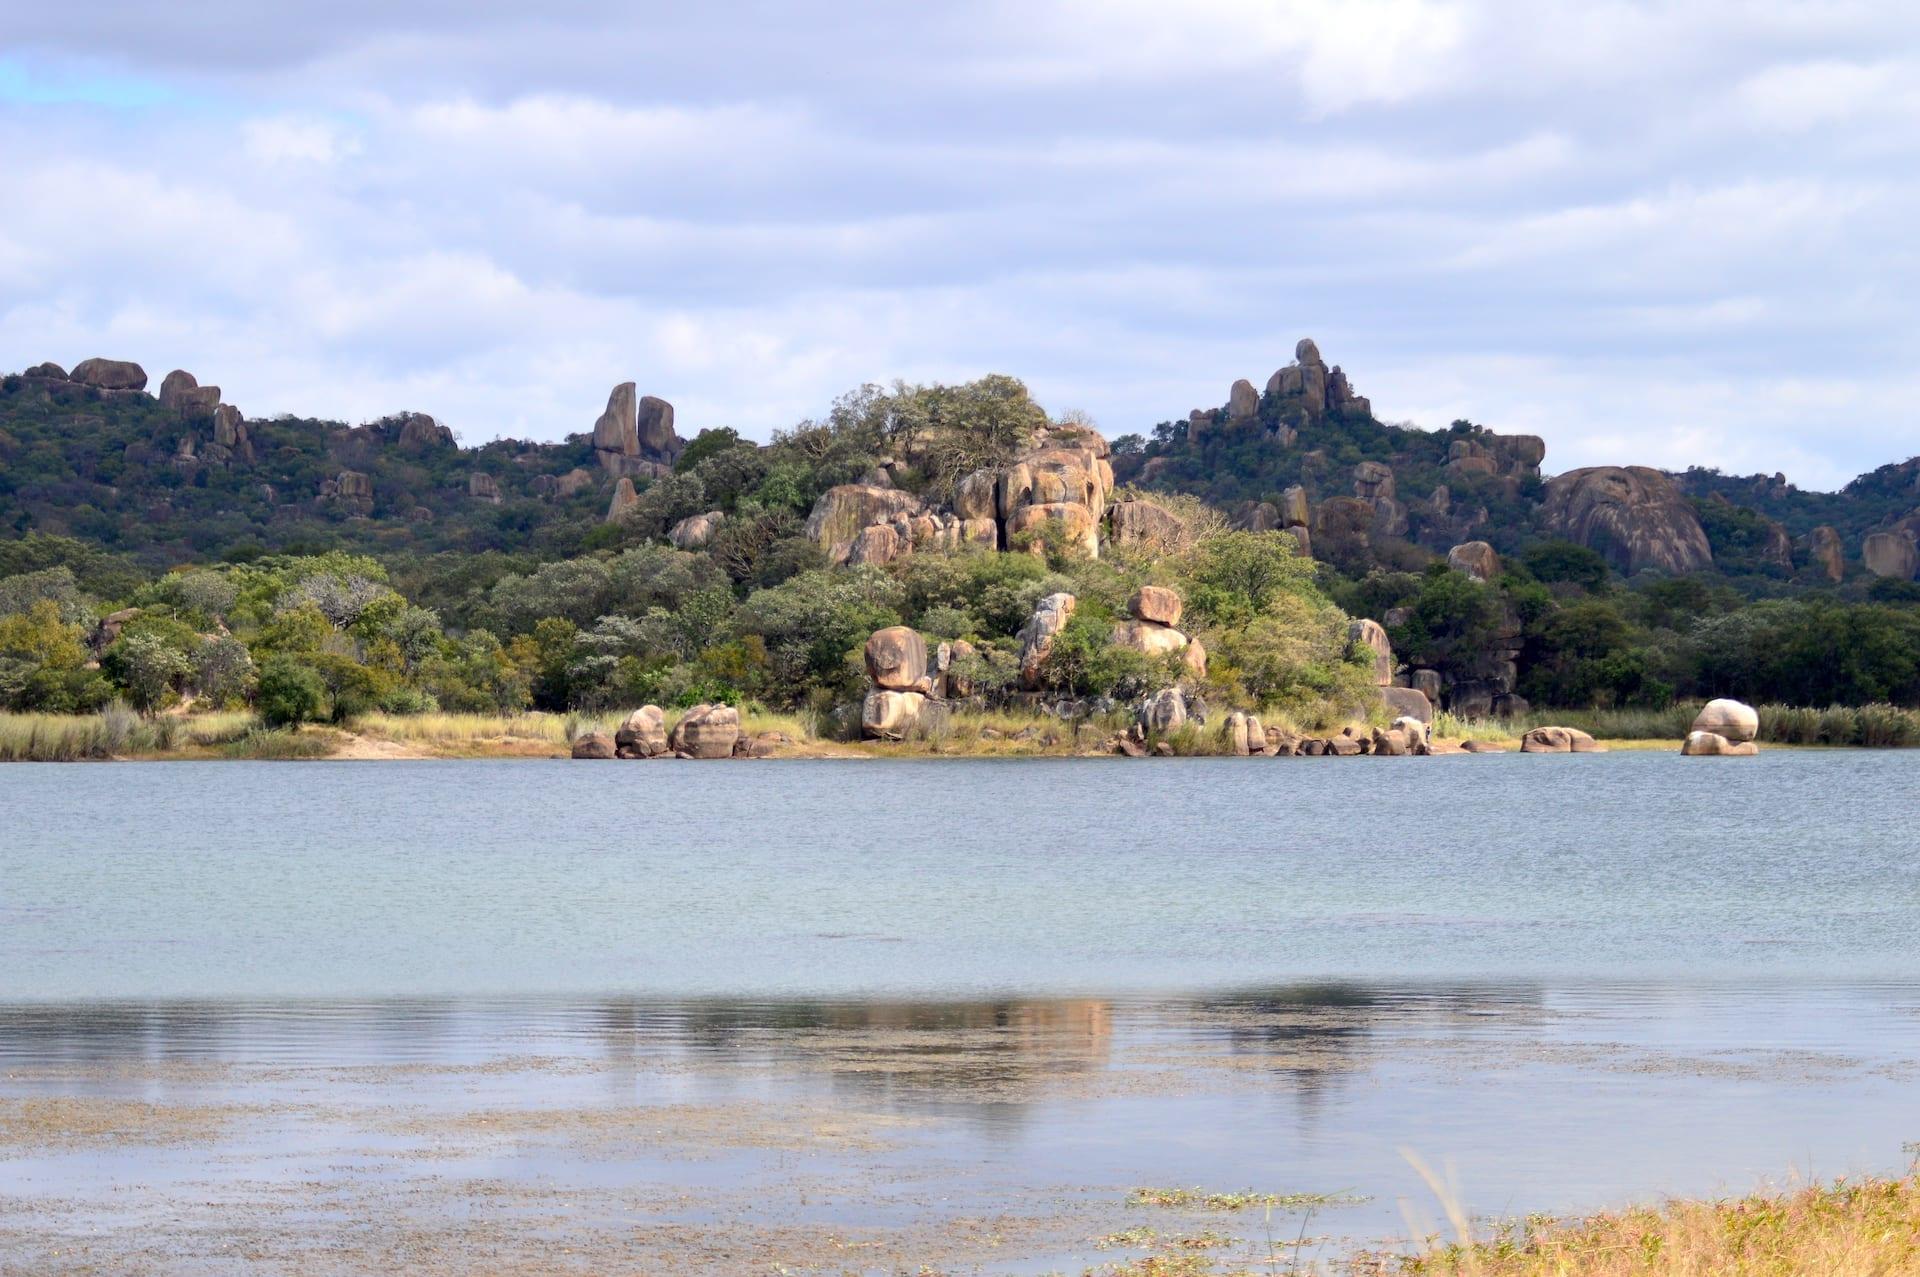 # FOTO - Matobo Hill0175